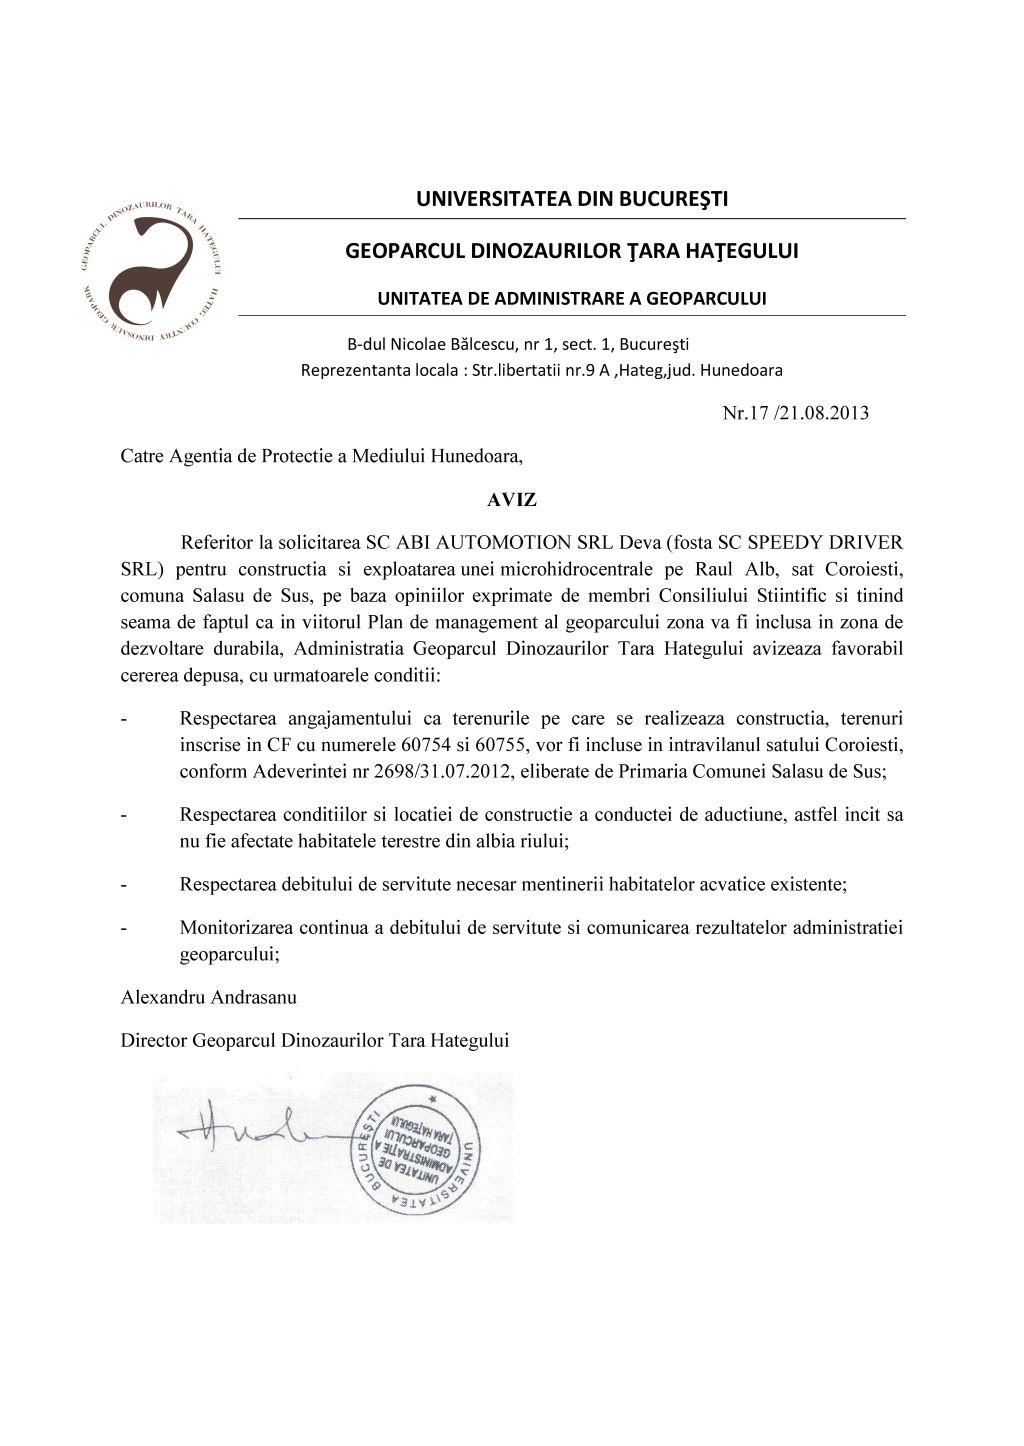 Anexa 1 aviz Geoparc pentru MHC Raul Alb